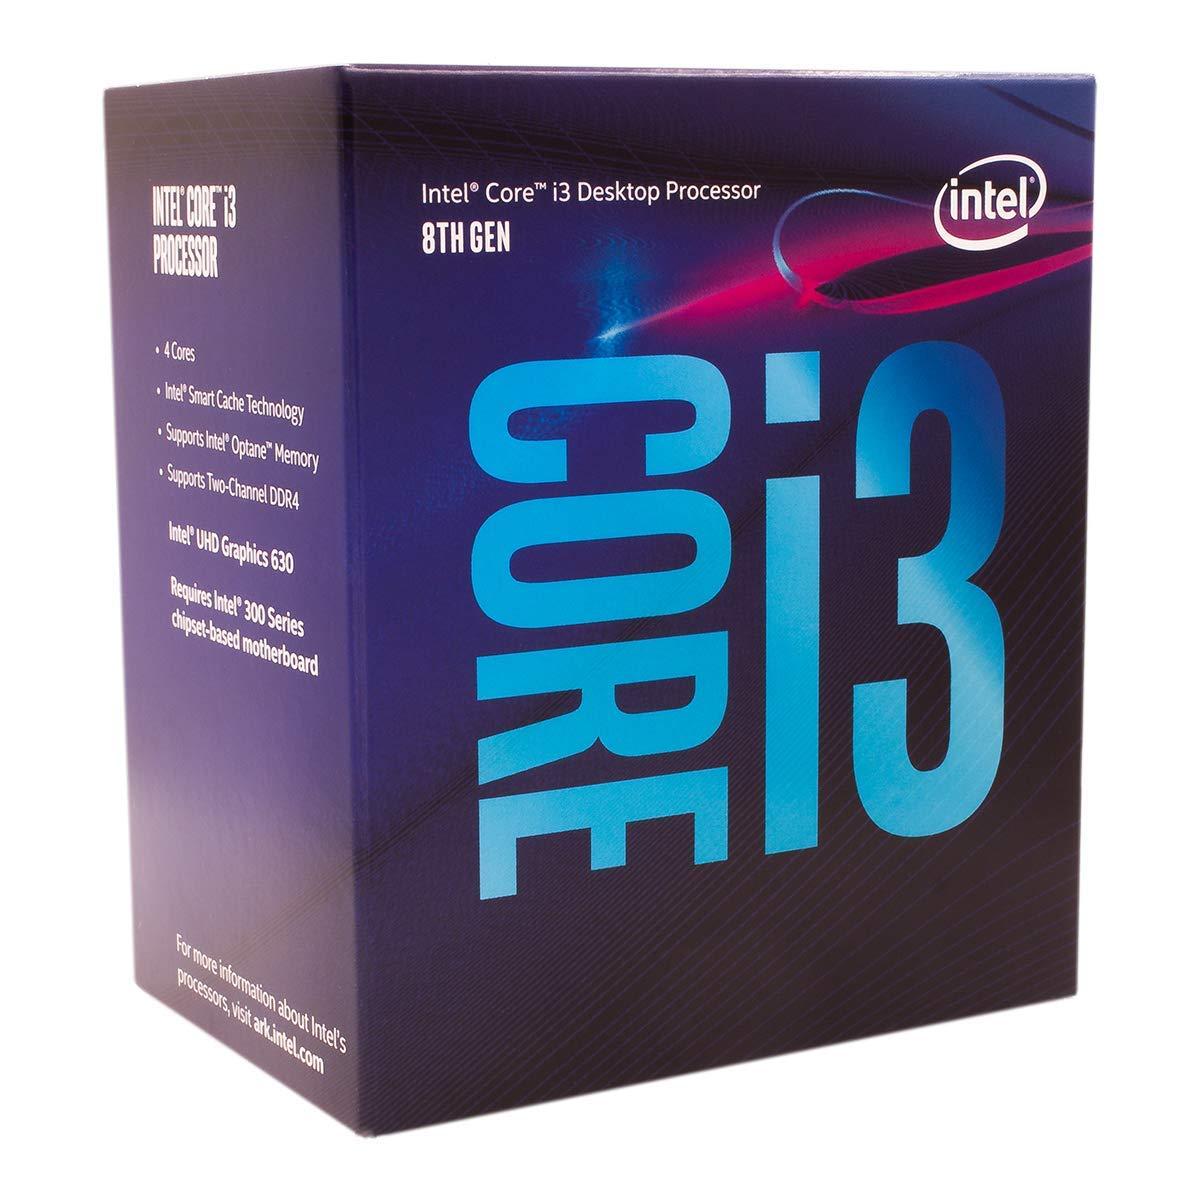 1 CPU - Intel Core i3-8100 Desktop Processor - Best $500 PC Build 2019